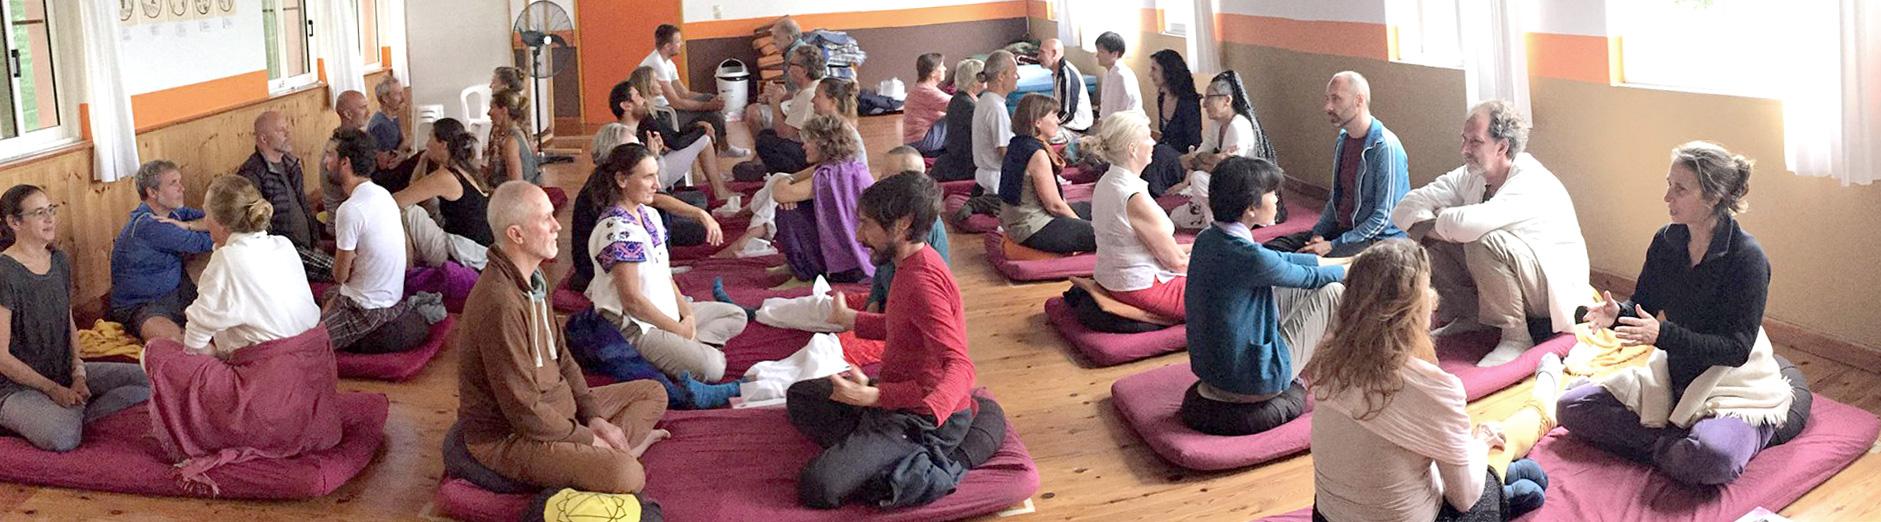 Meditation Zen Satori Retreat October 2021